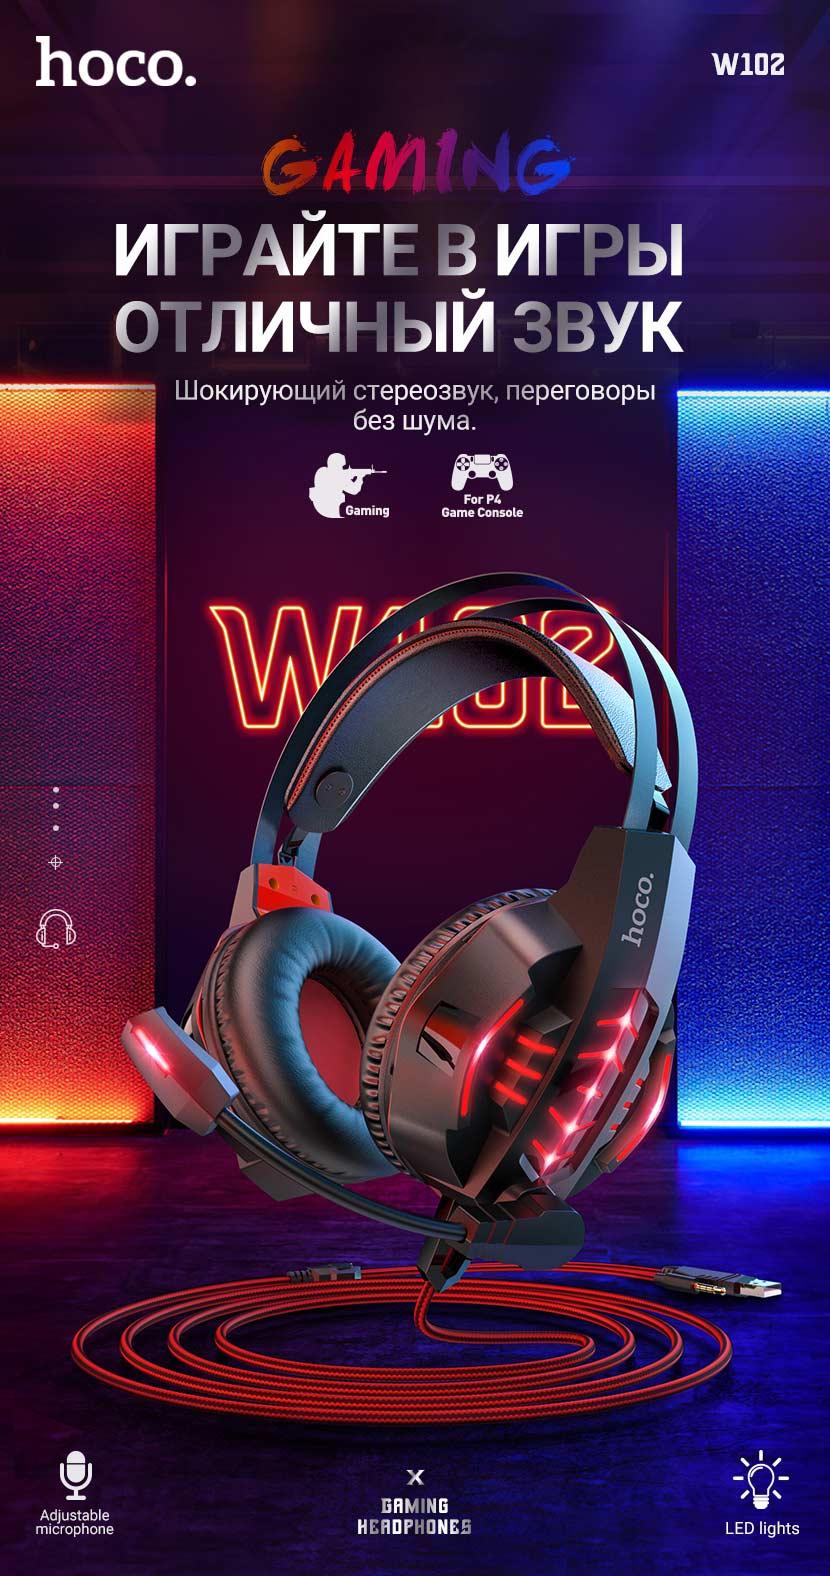 hoco news w102 cool tour gaming headphones ru